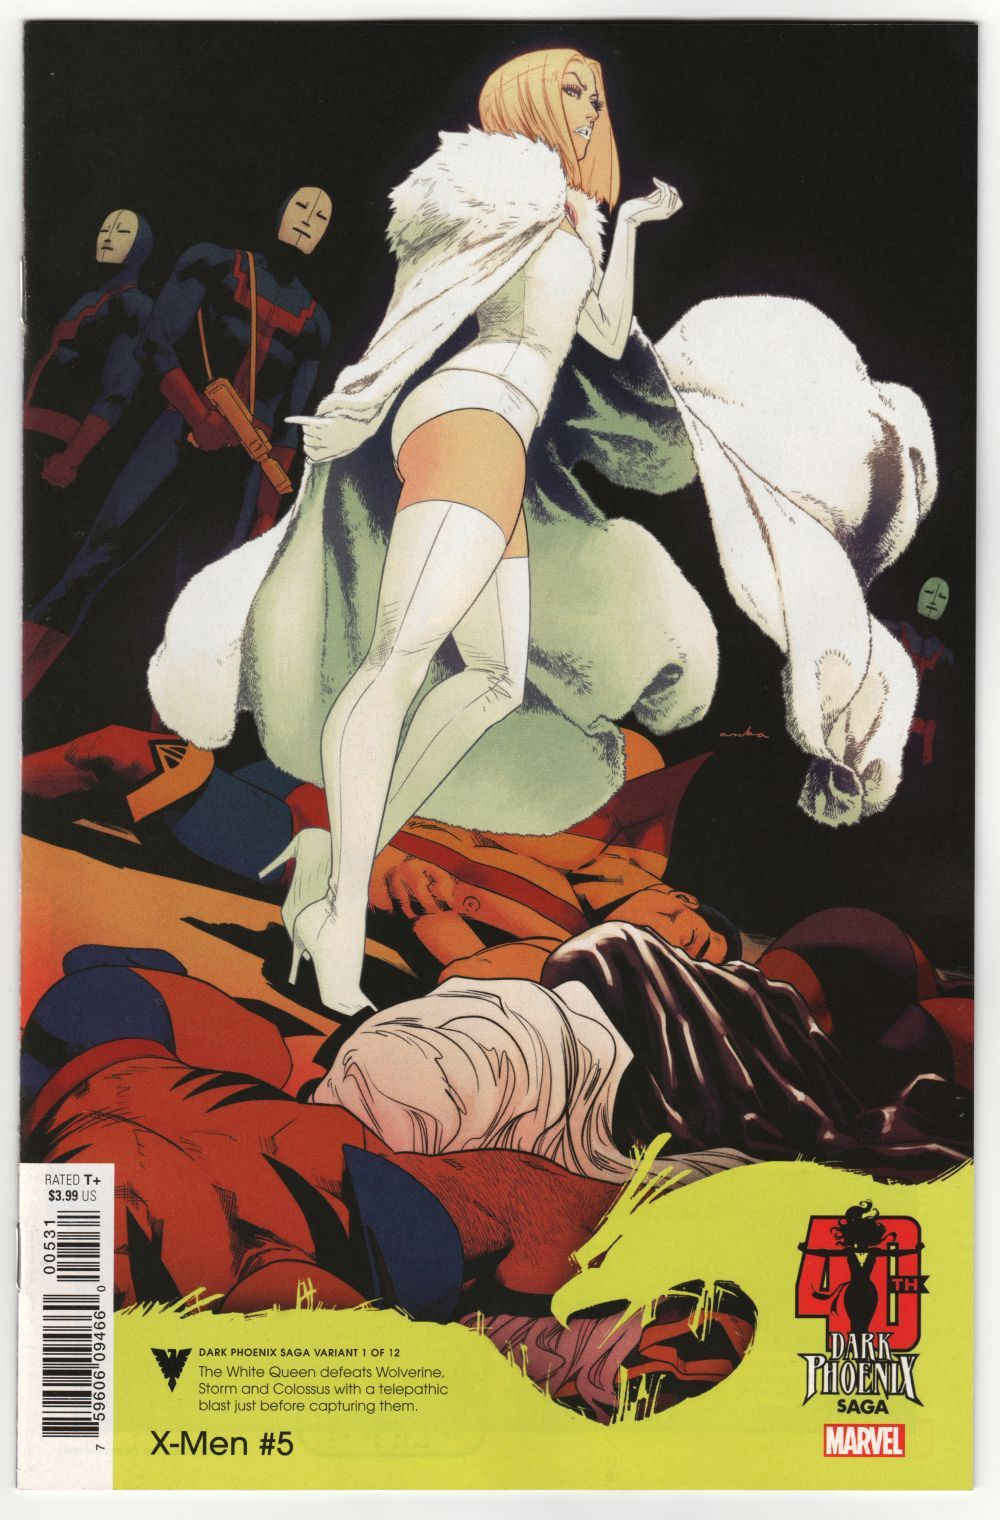 X Men 5 Anka Dark Phoenix 40th Variant Marvel 2020 Nm In 2020 Comic Books Art Dark Phoenix X Men 5